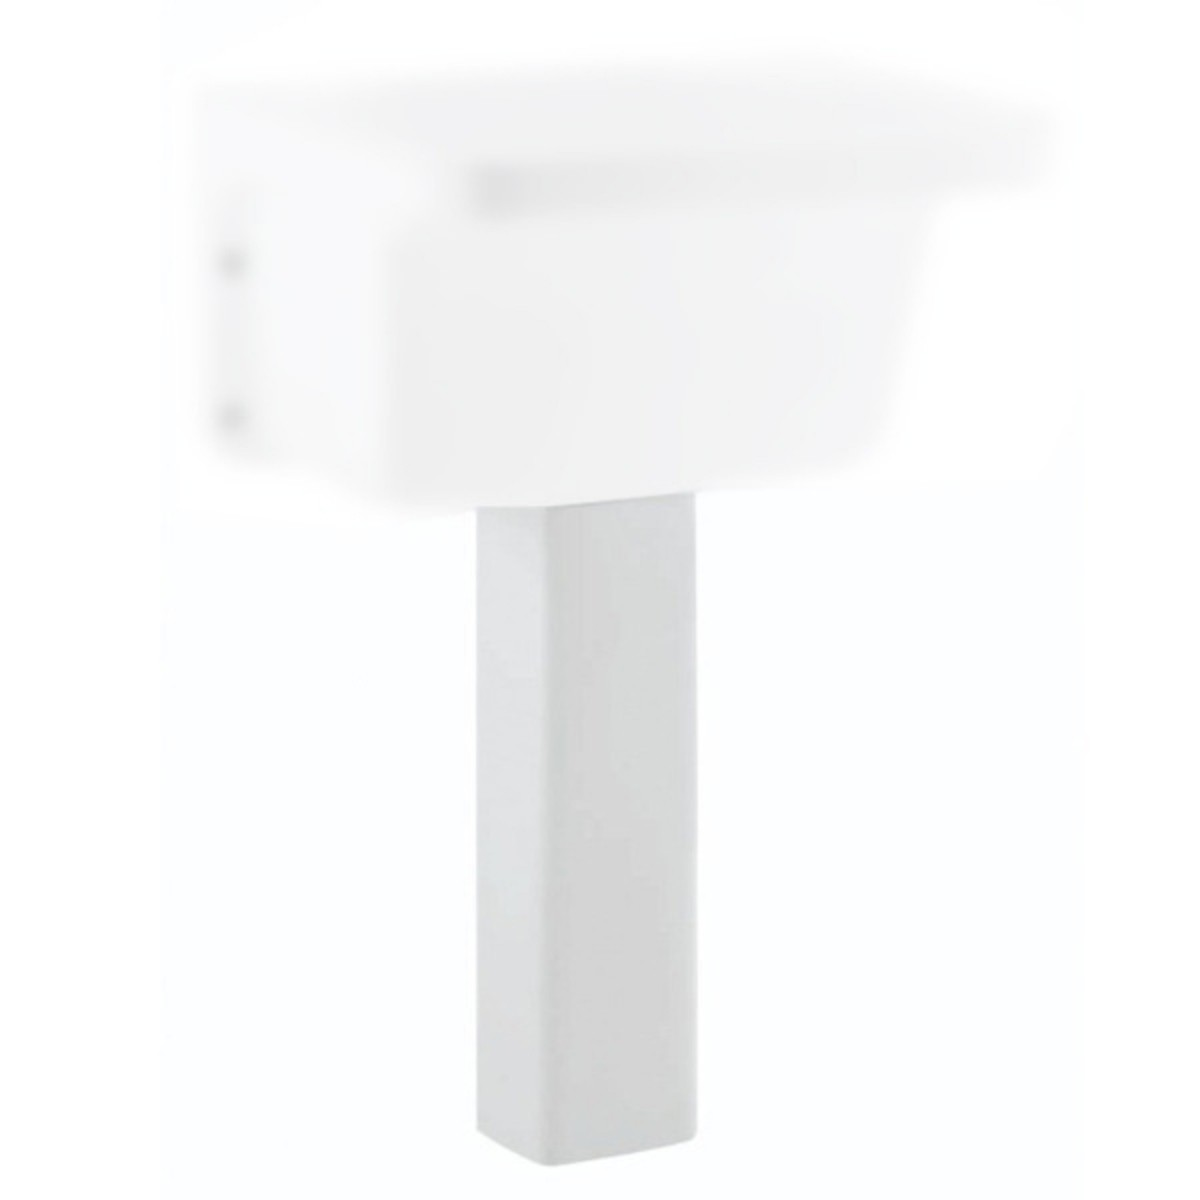 Coluna Para Tanque Deca Branco TQ 02/03 Ref. CT.25.17